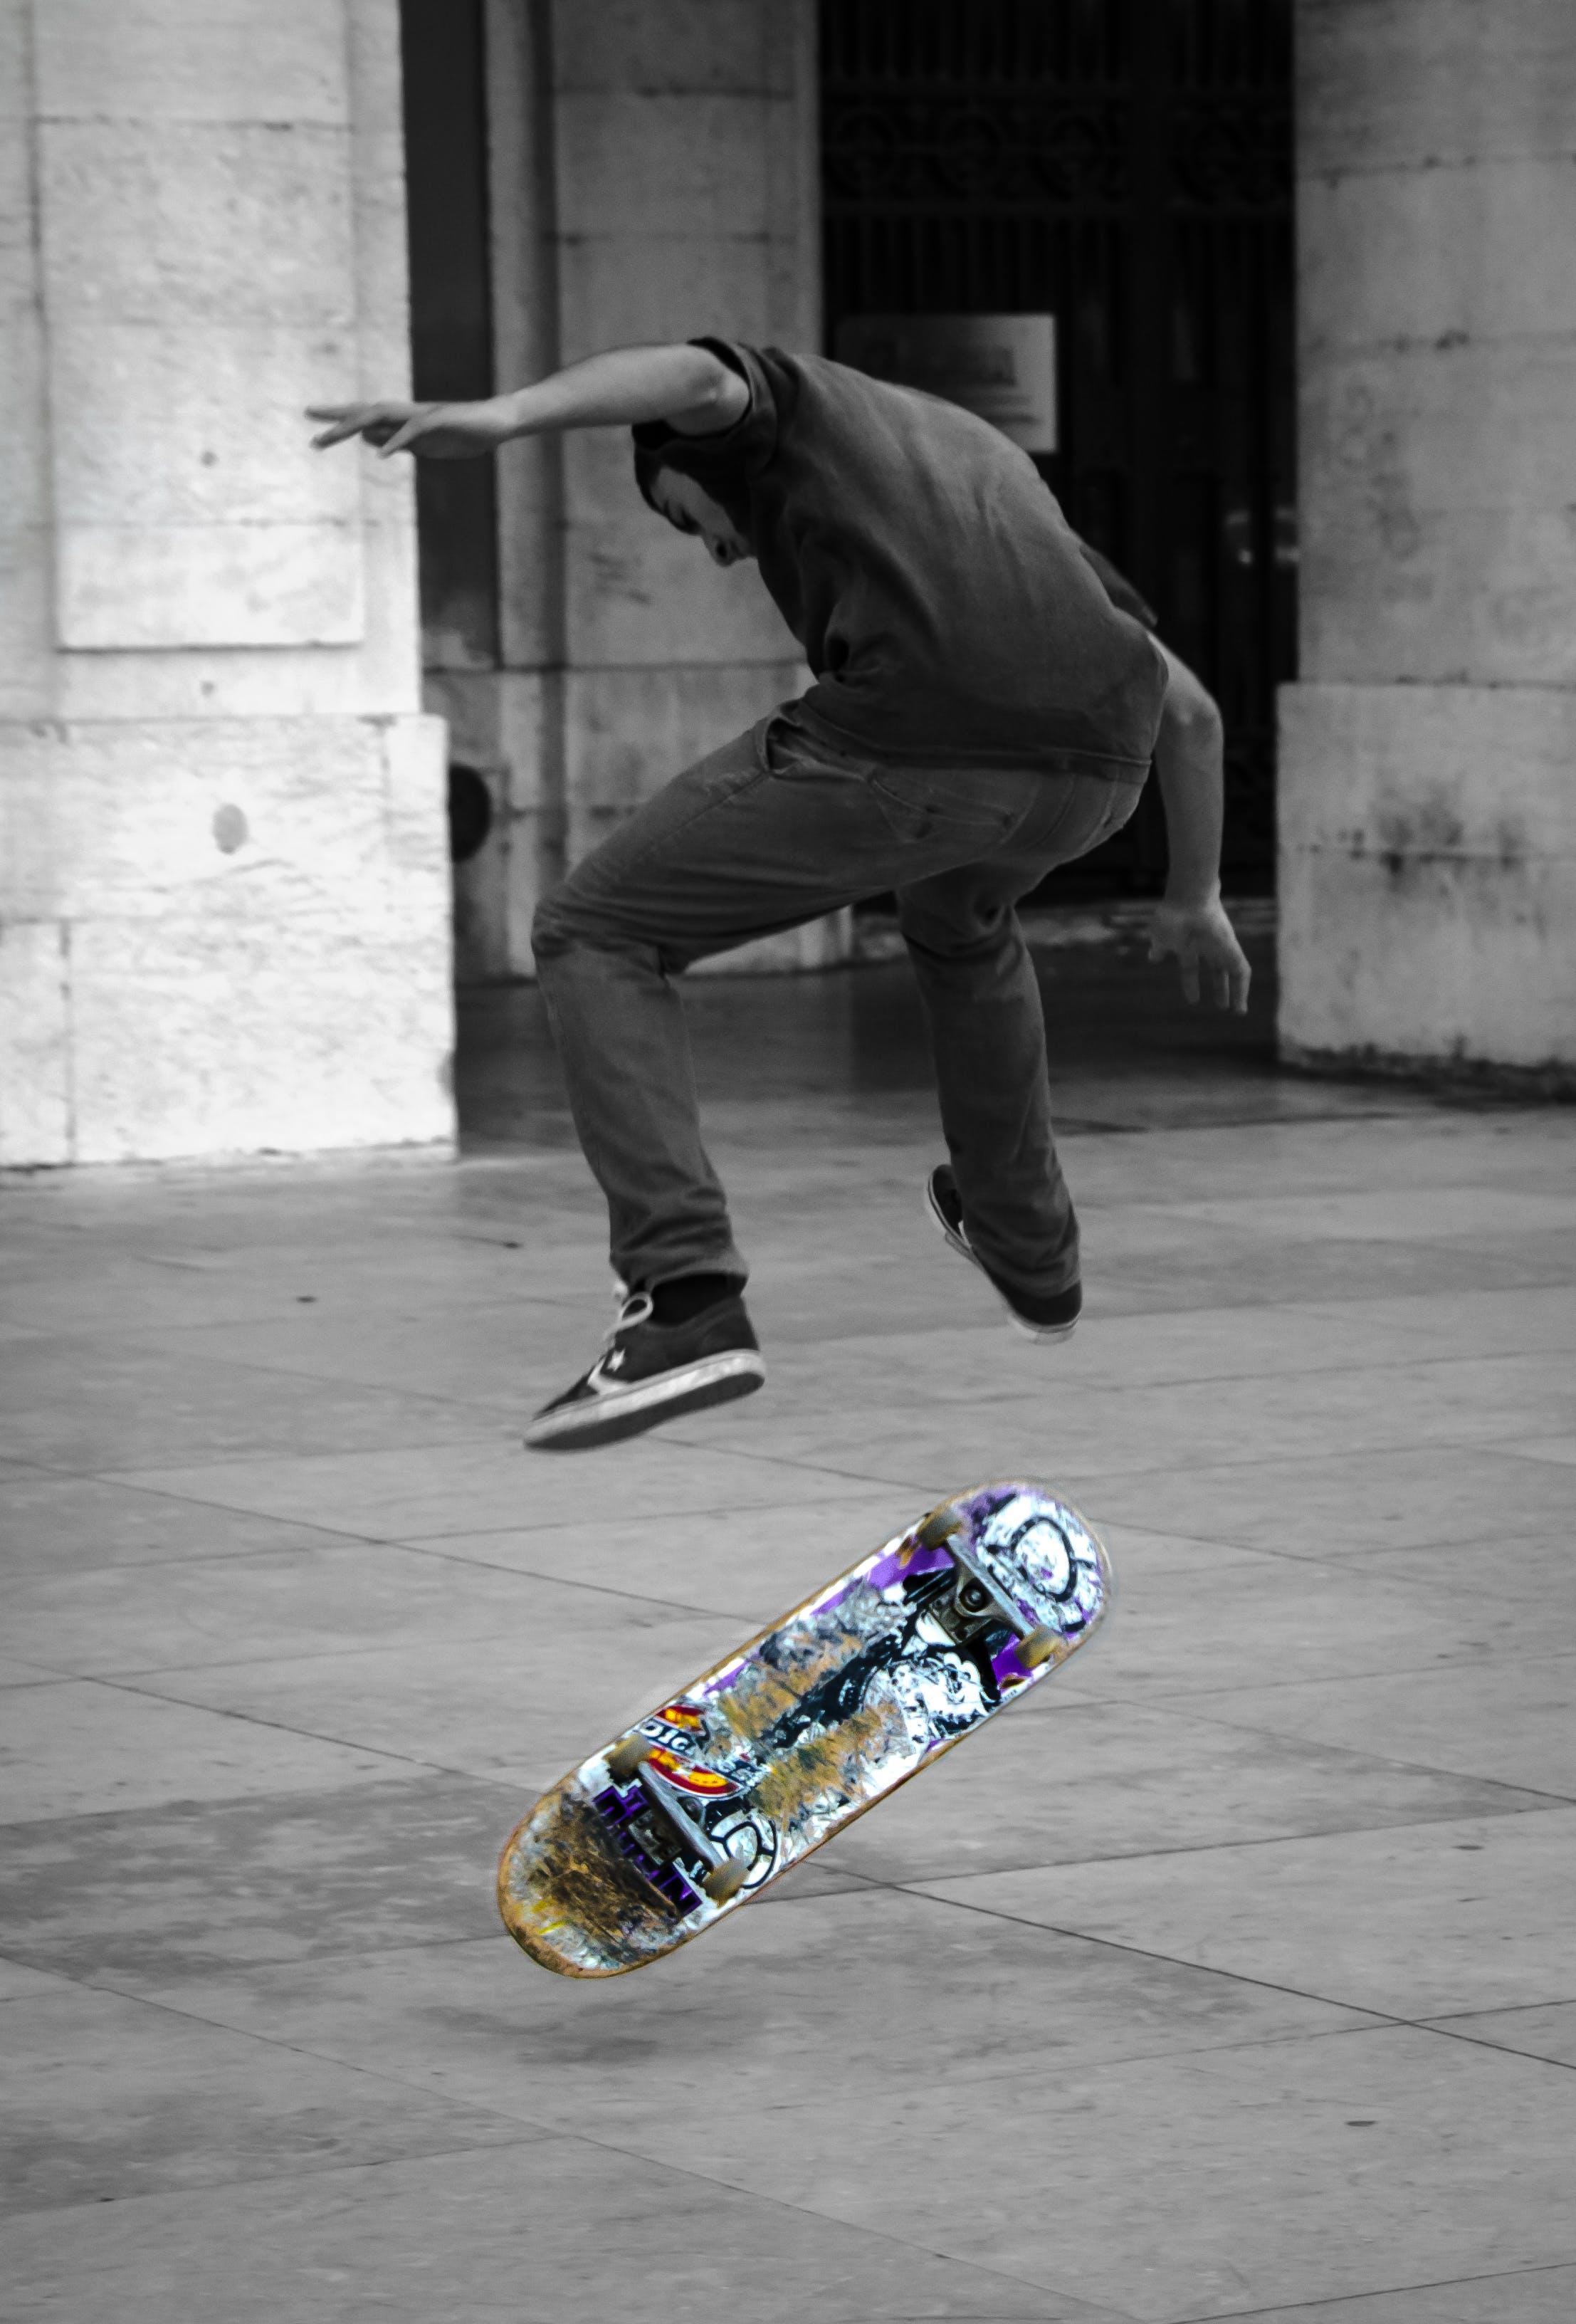 Free stock photo of city, skateboard, urban, youth